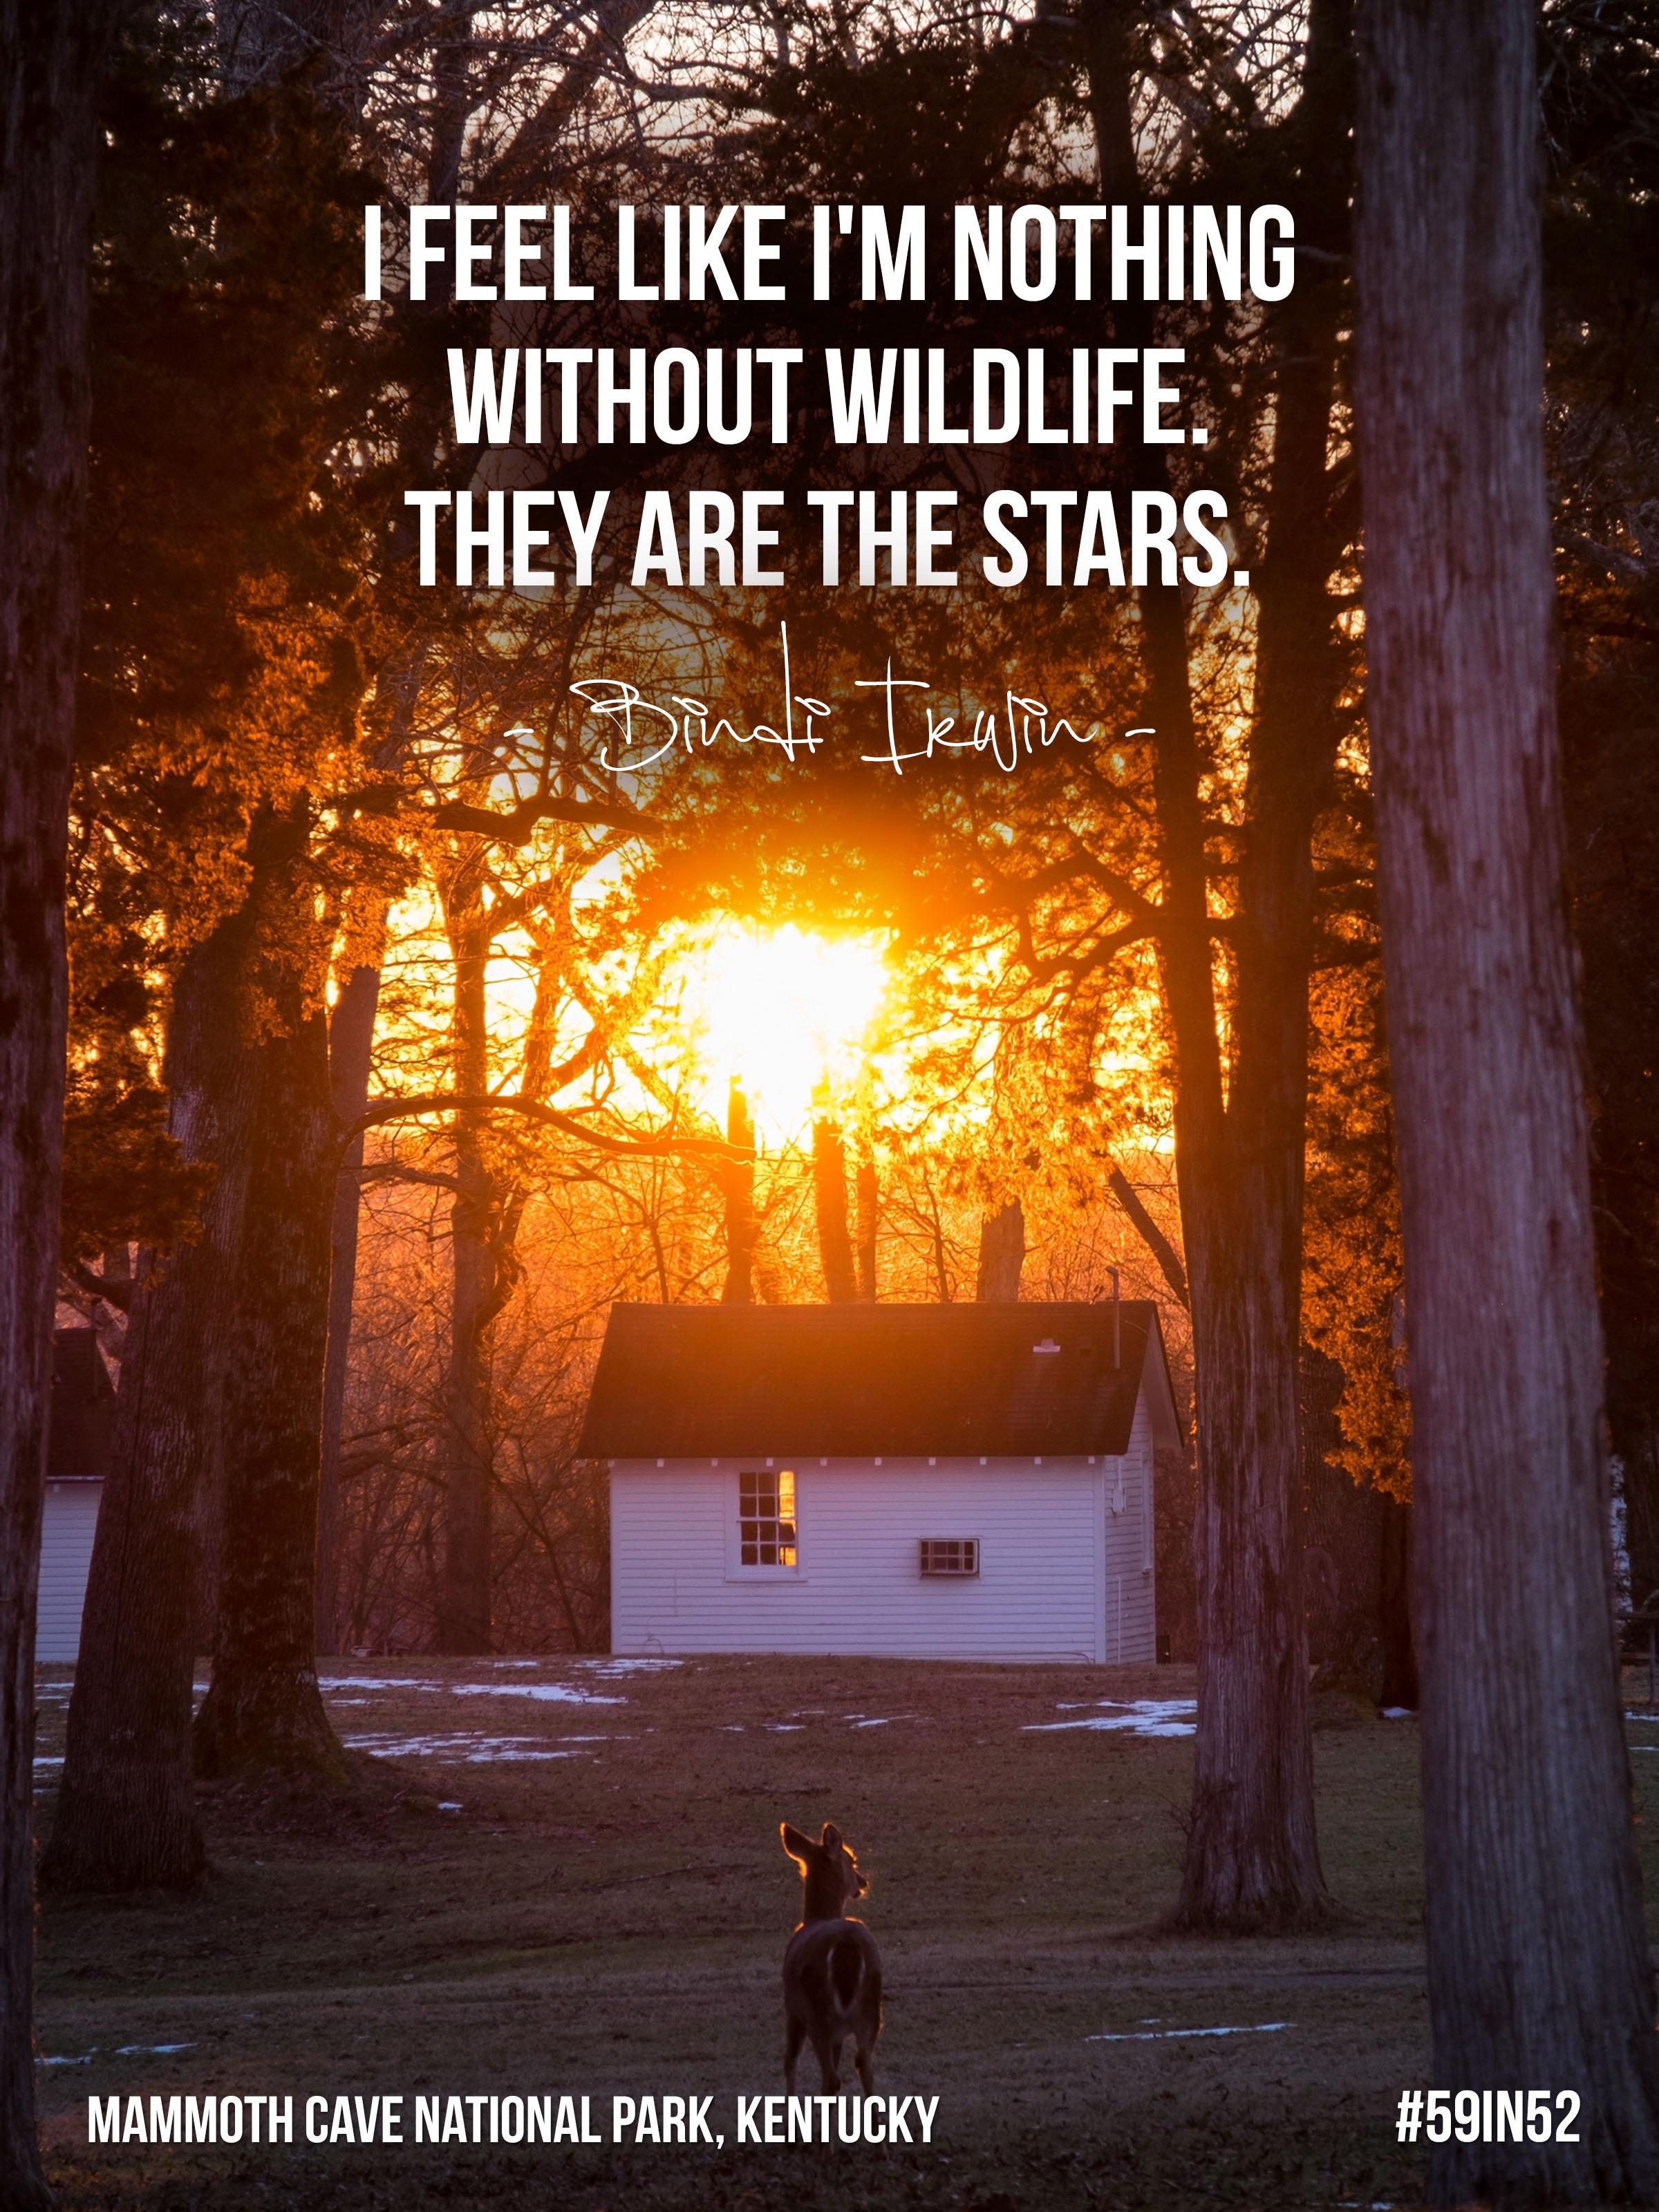 """I feel like I am nothing without wildlife. They are the stars."" Bindi Irwin"